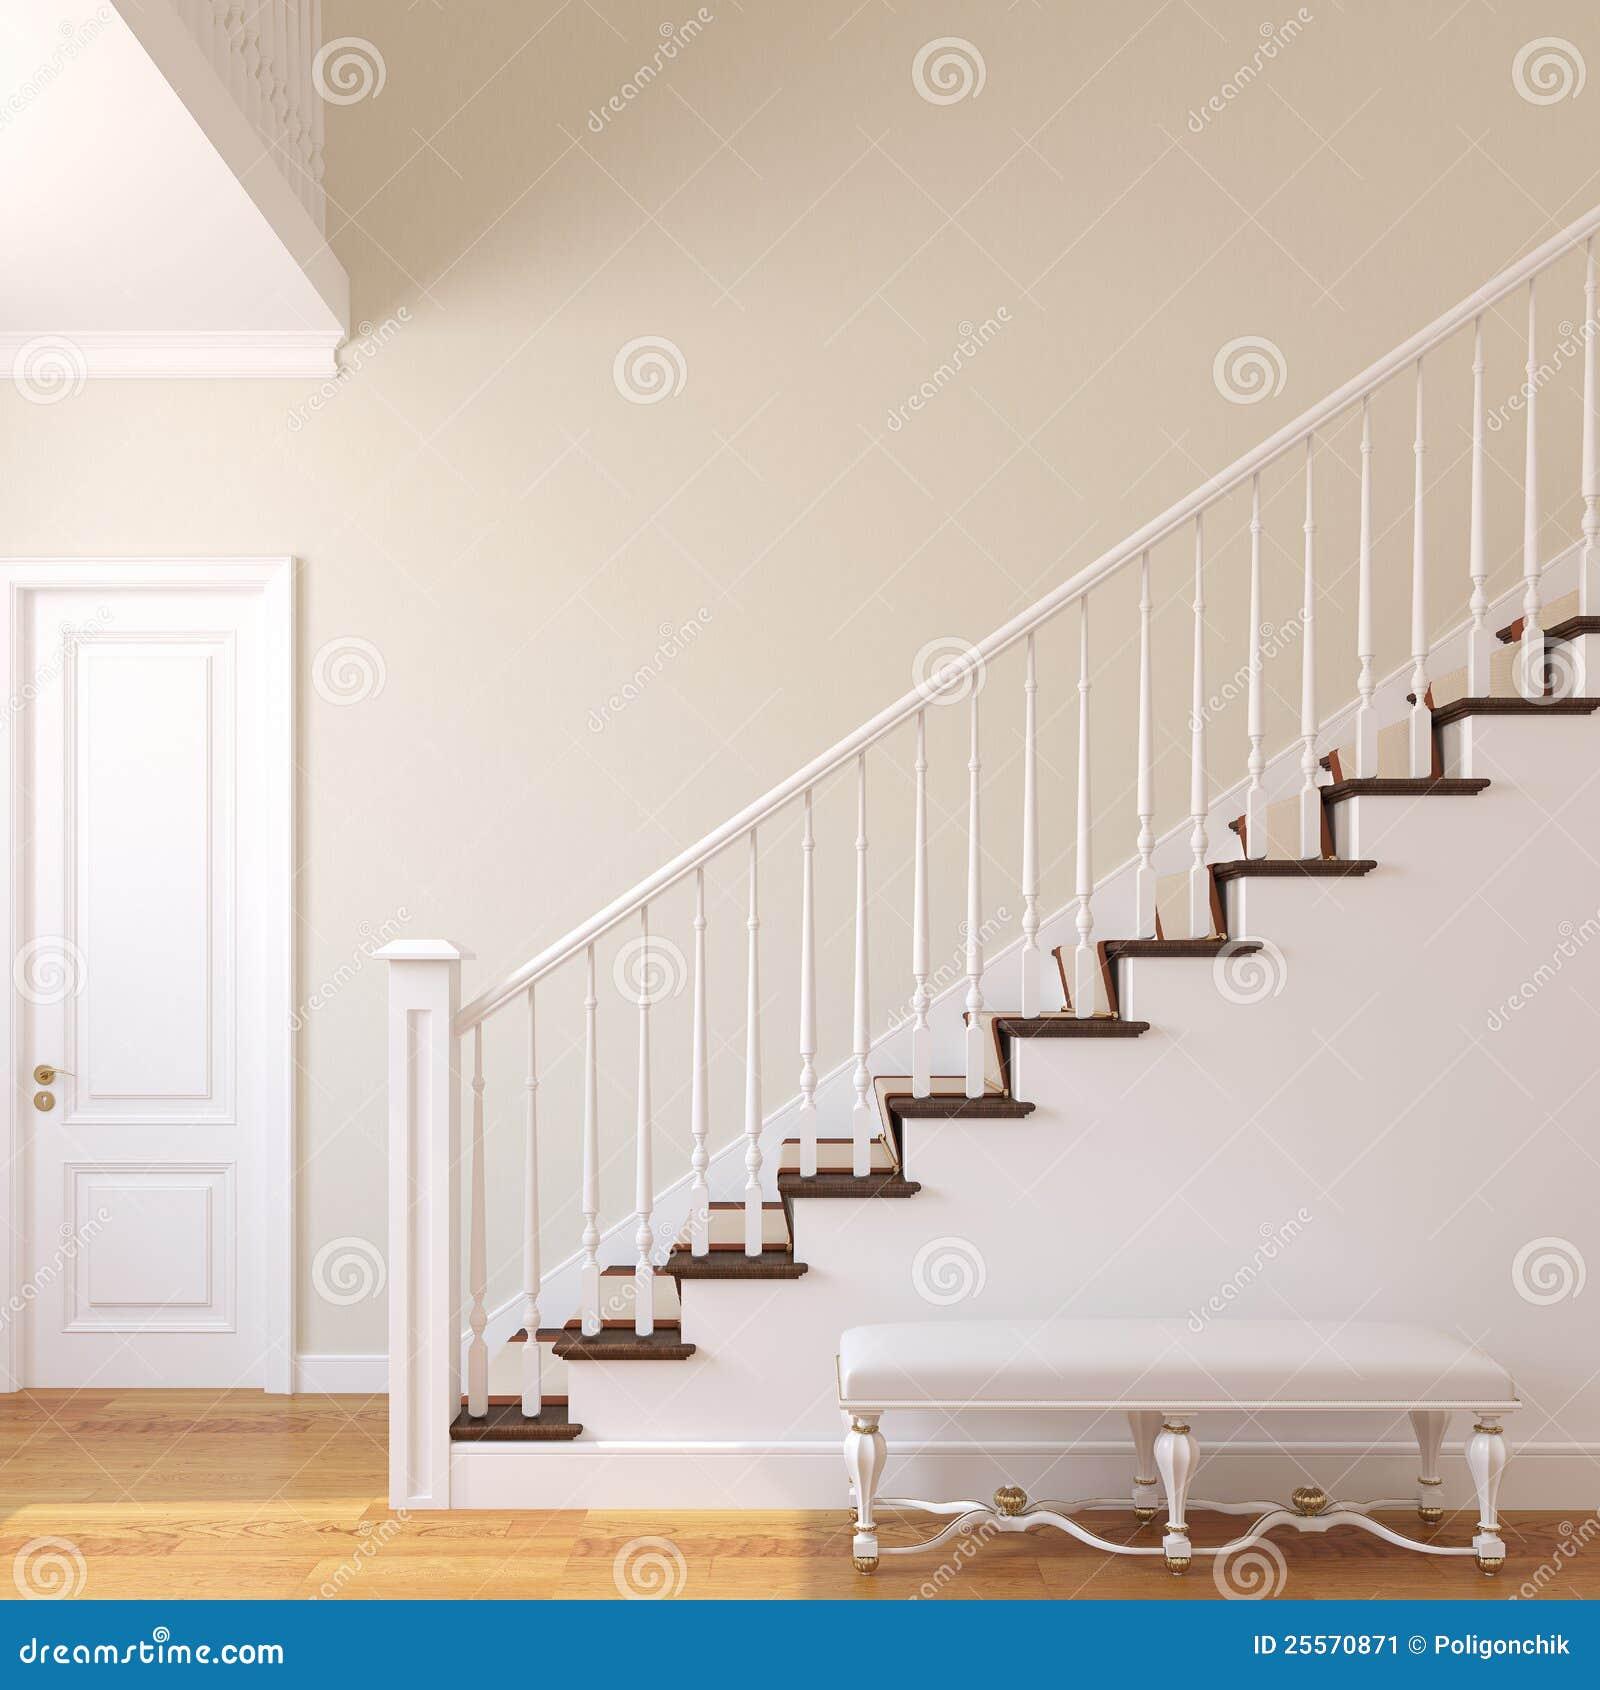 Escalier Dans La Maison escalier dans la maison moderne. illustration stock